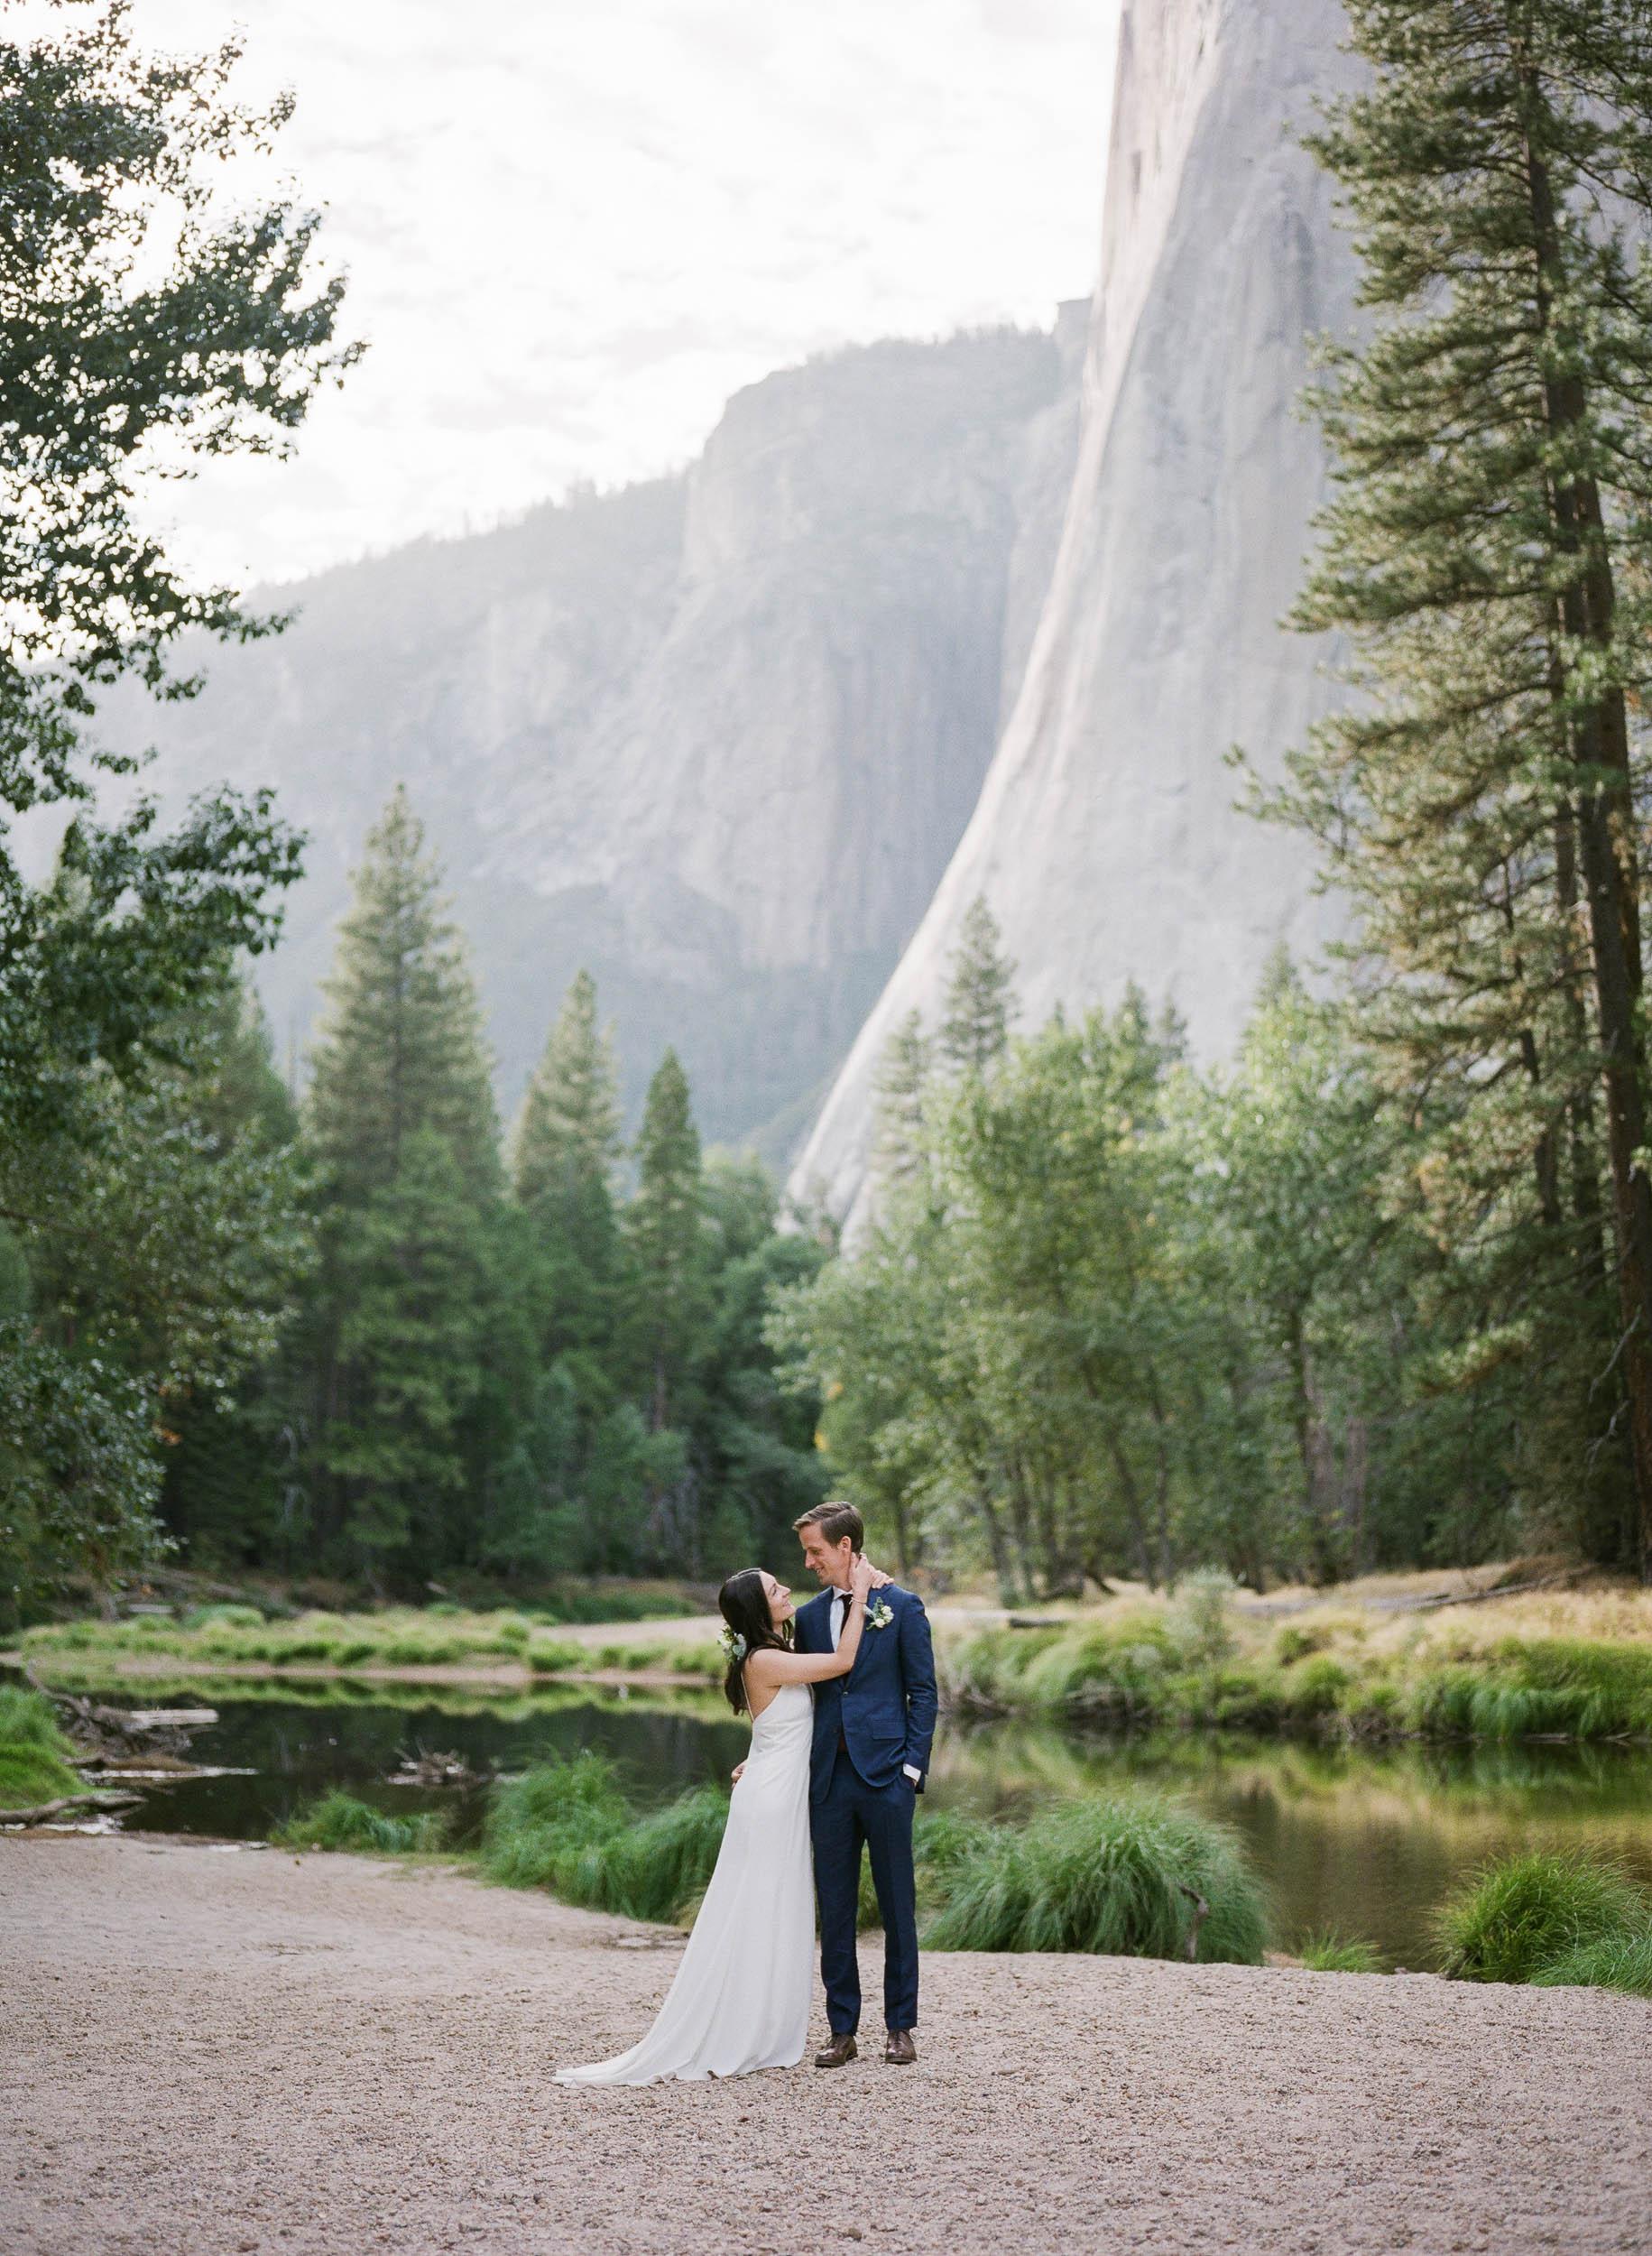 Intimate Yosemite Wedding_Buena Lane Photography_000063830005.jpg